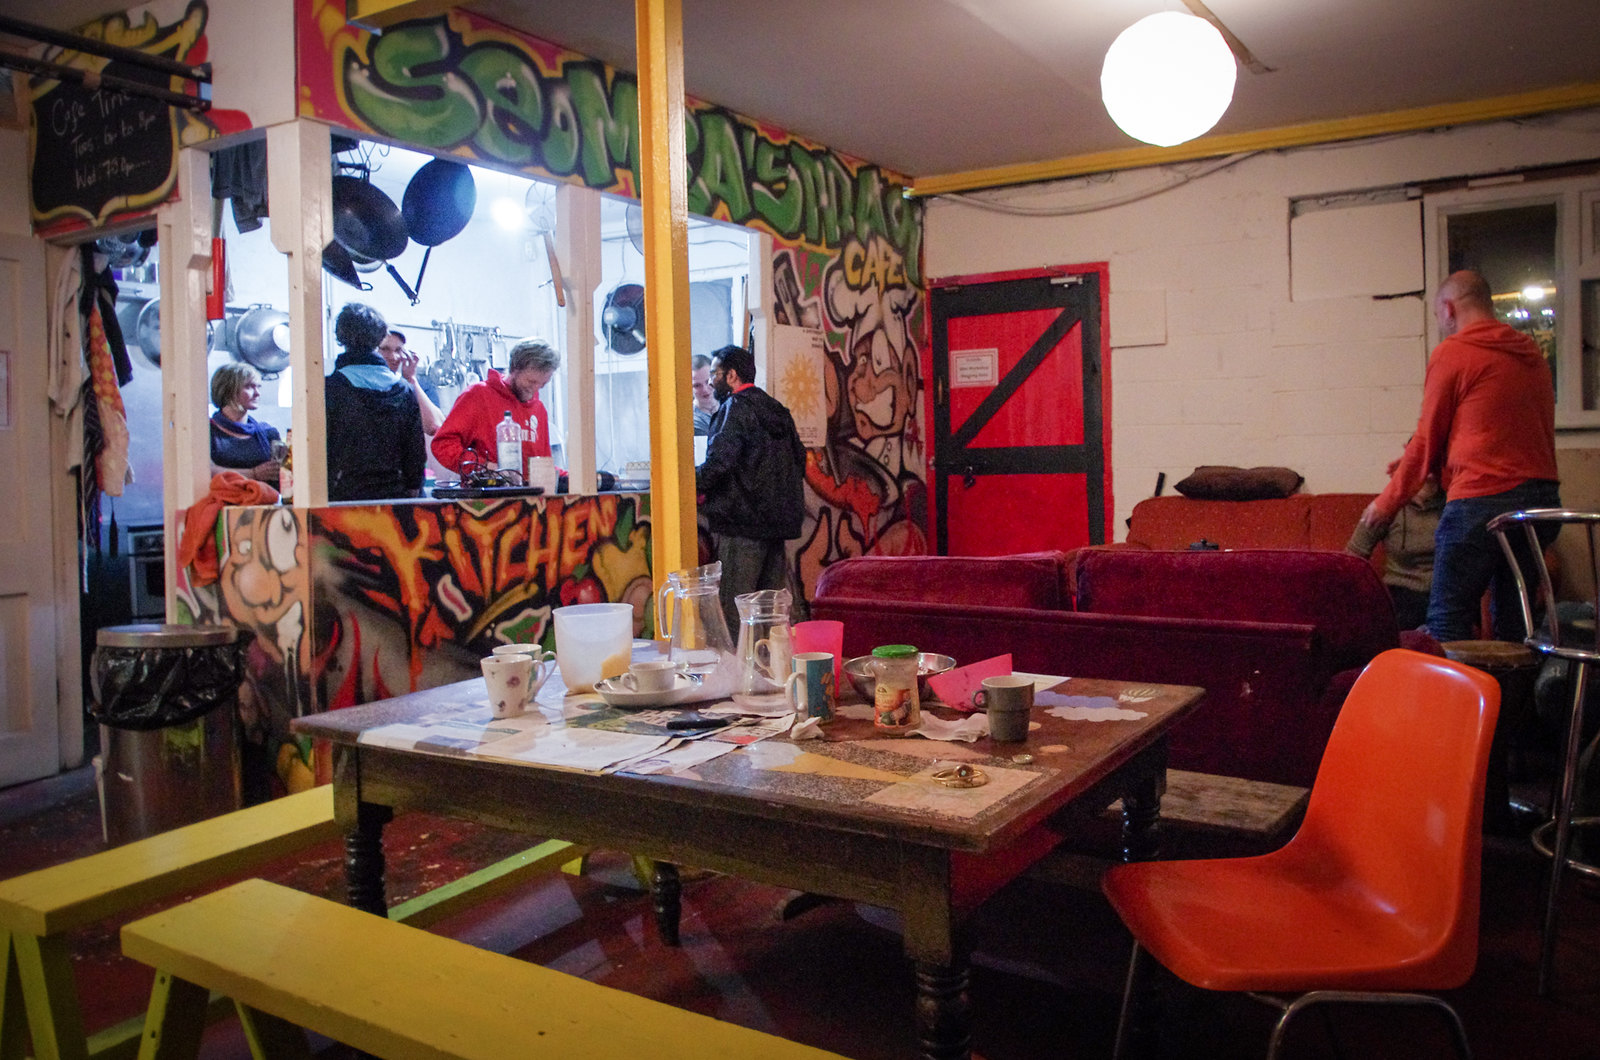 Dublin alternatif - Seomra Spraoi - Table and kitchen